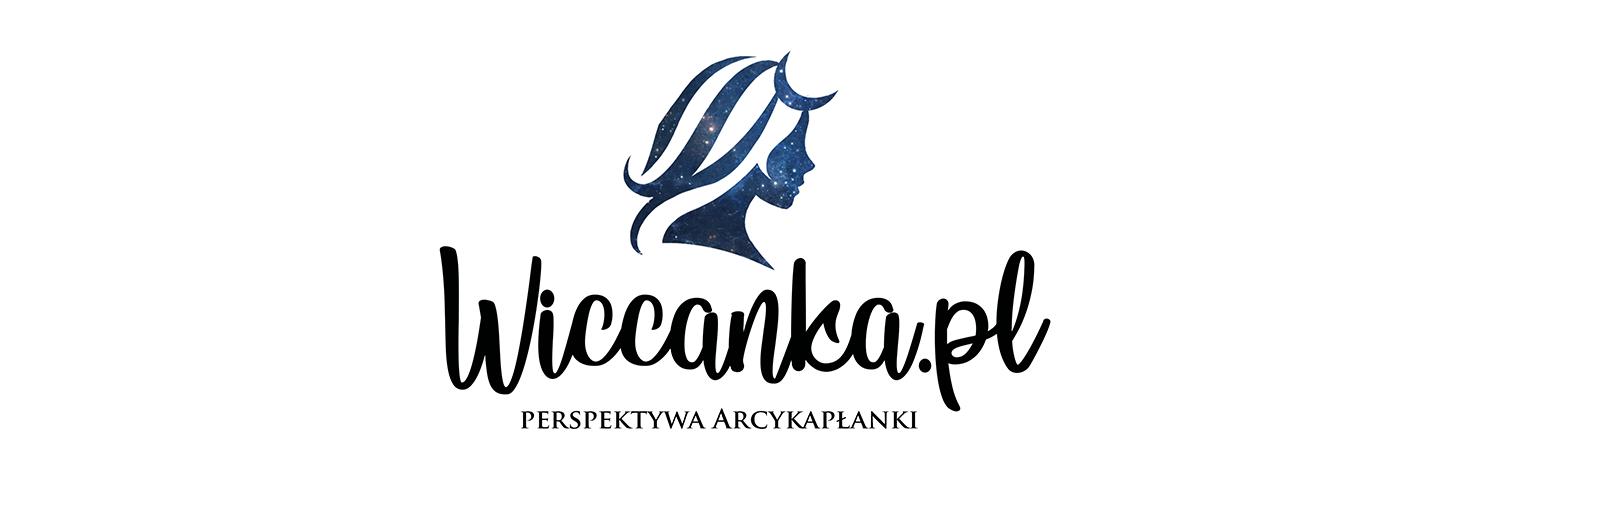 Wiccanka.pl